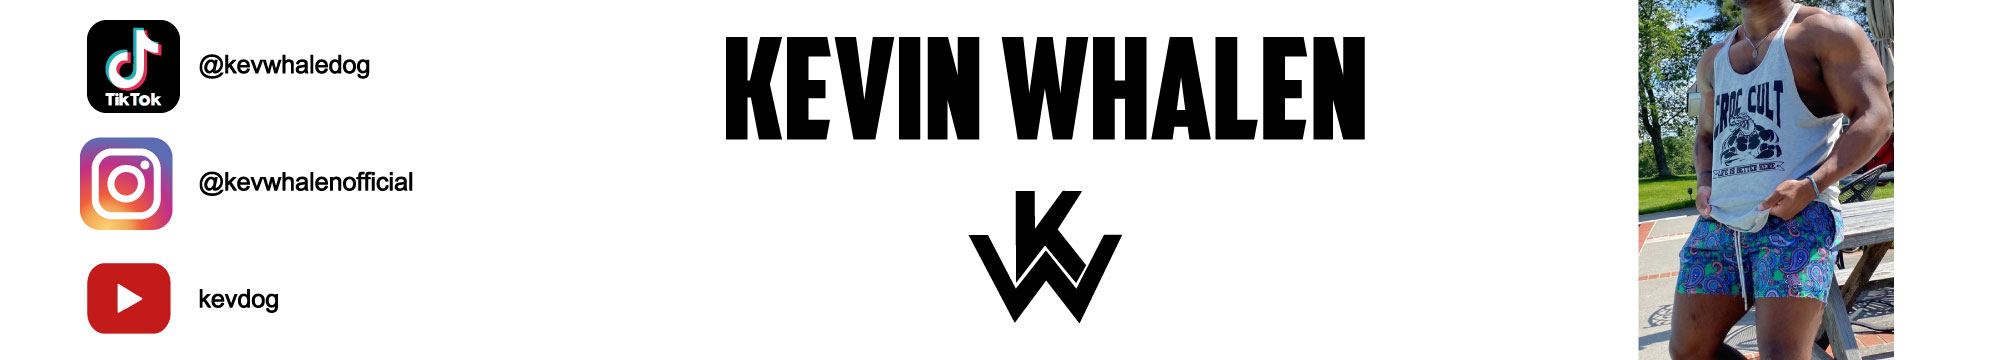 Kevin Whalen